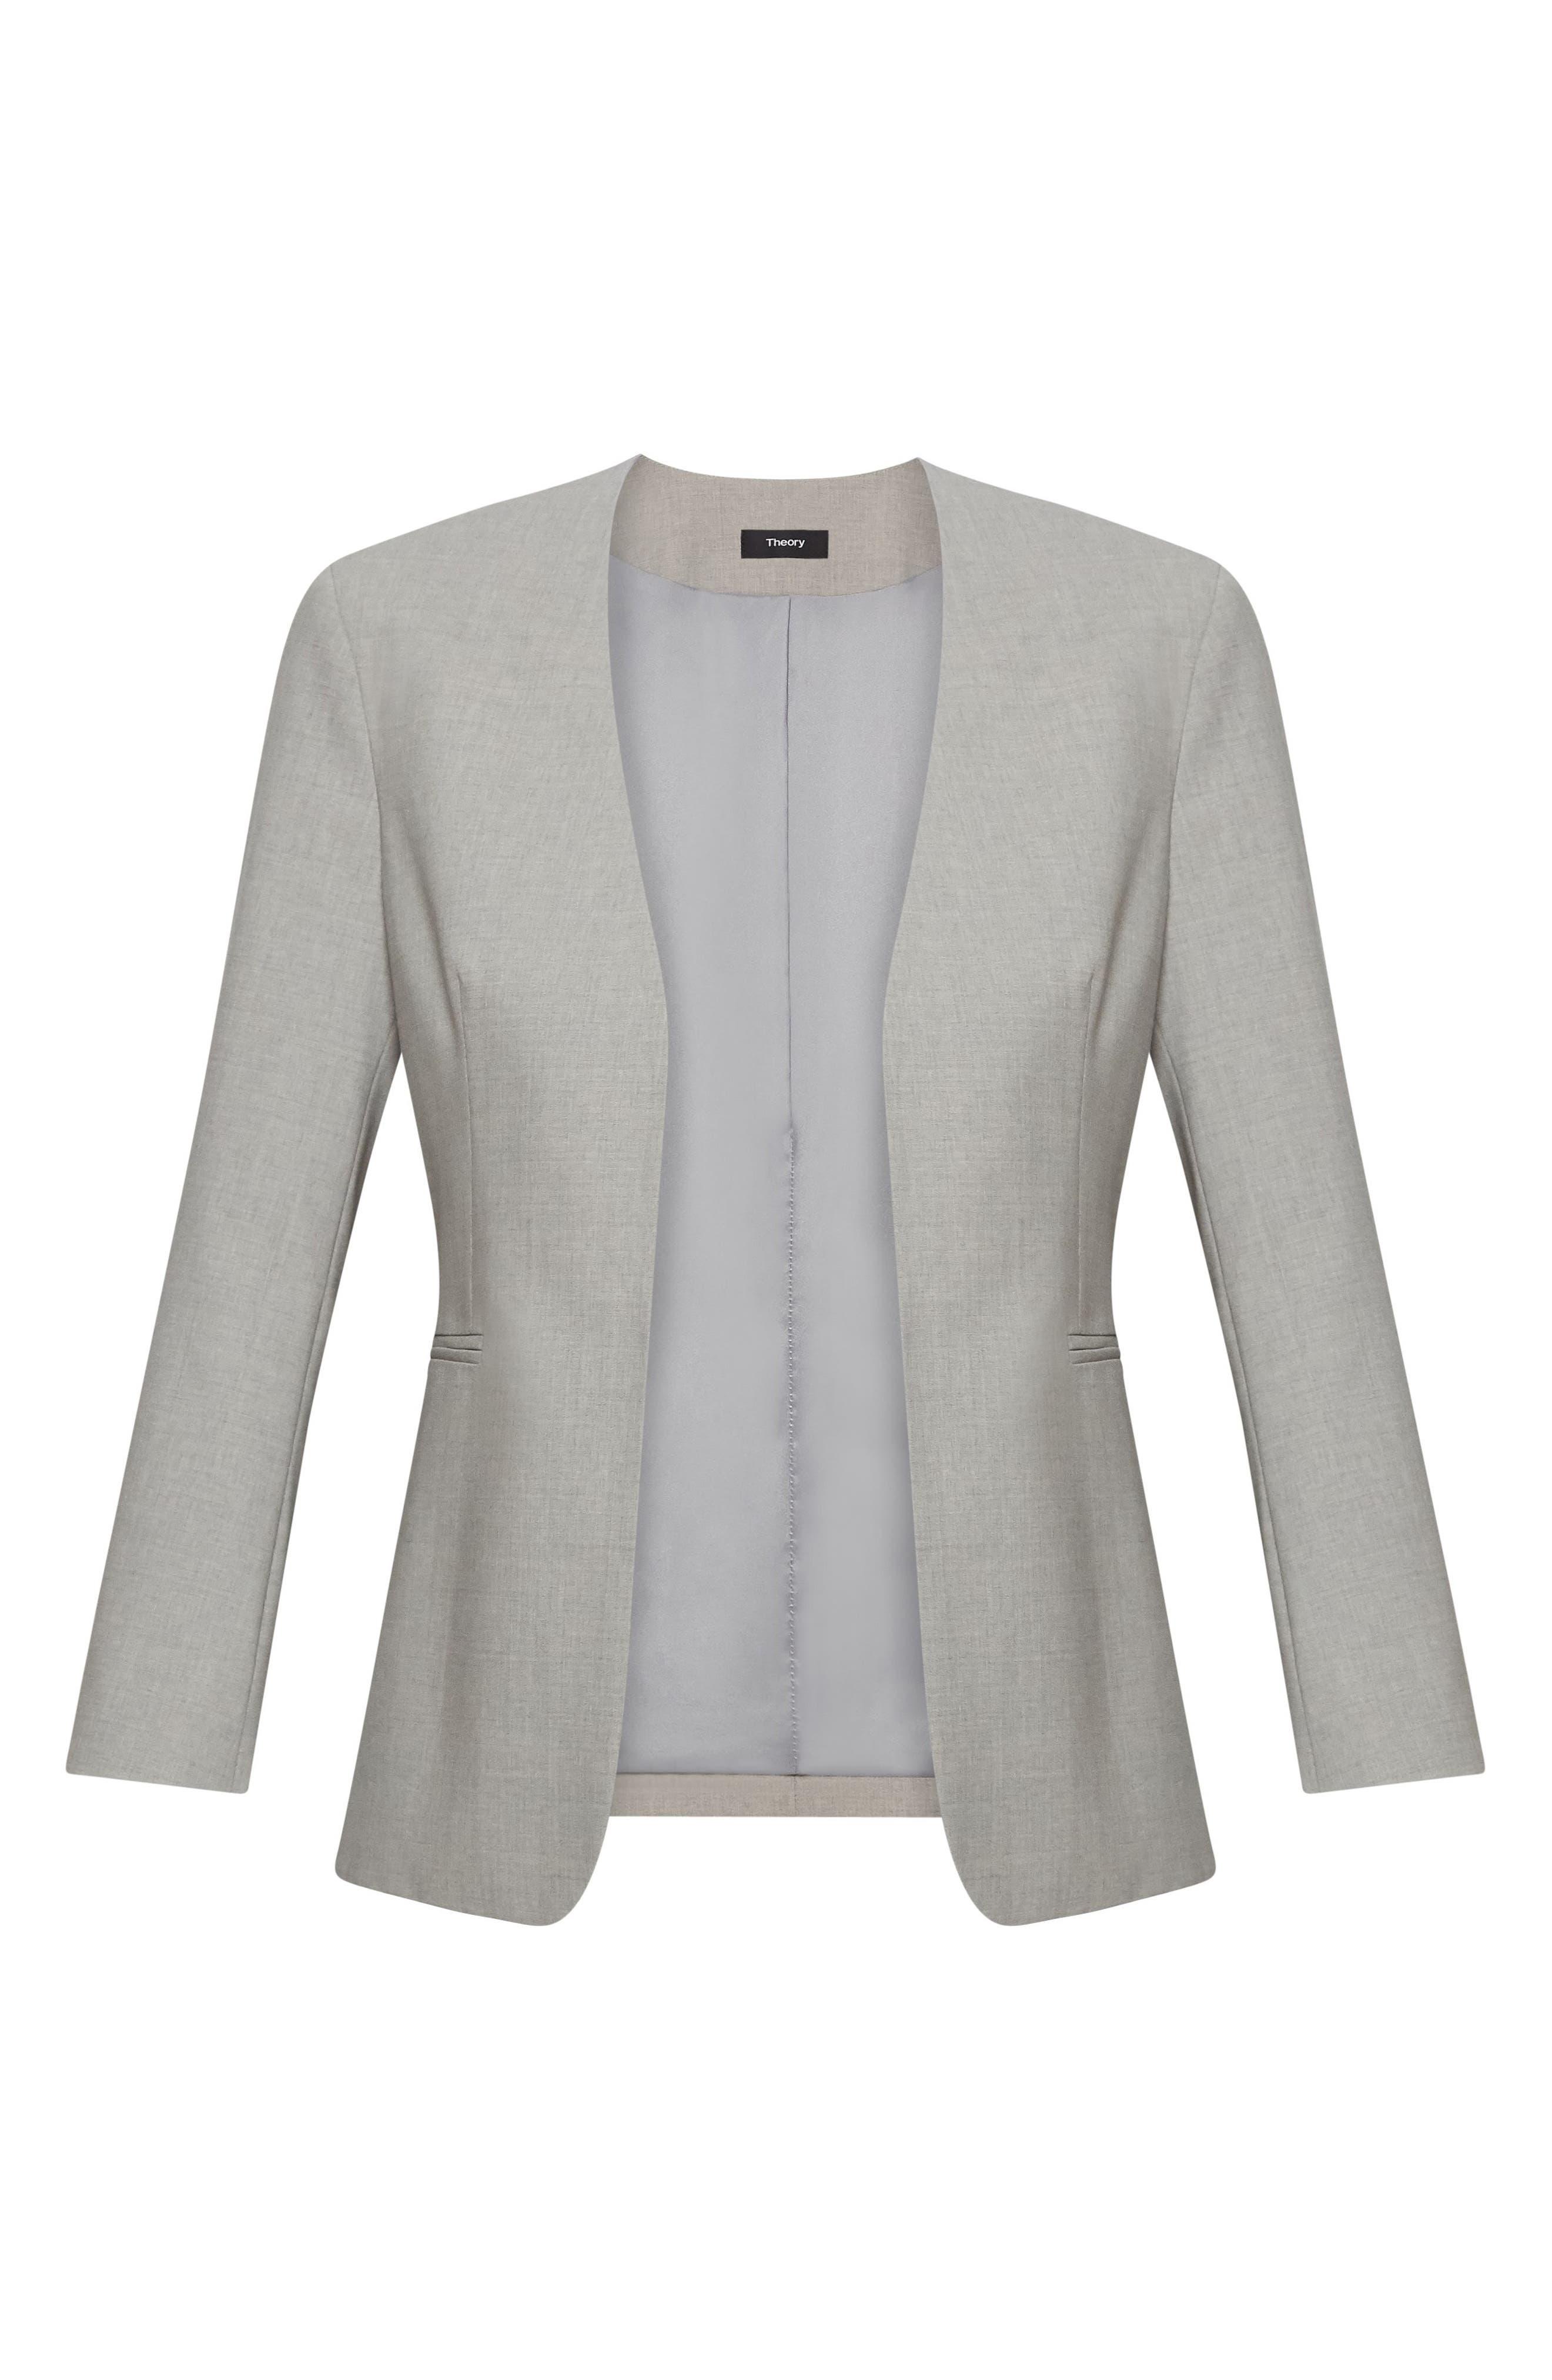 THEORY, Lindrayia B Good Wool Suit Jacket, Alternate thumbnail 5, color, LIGHT GREY MELANGE